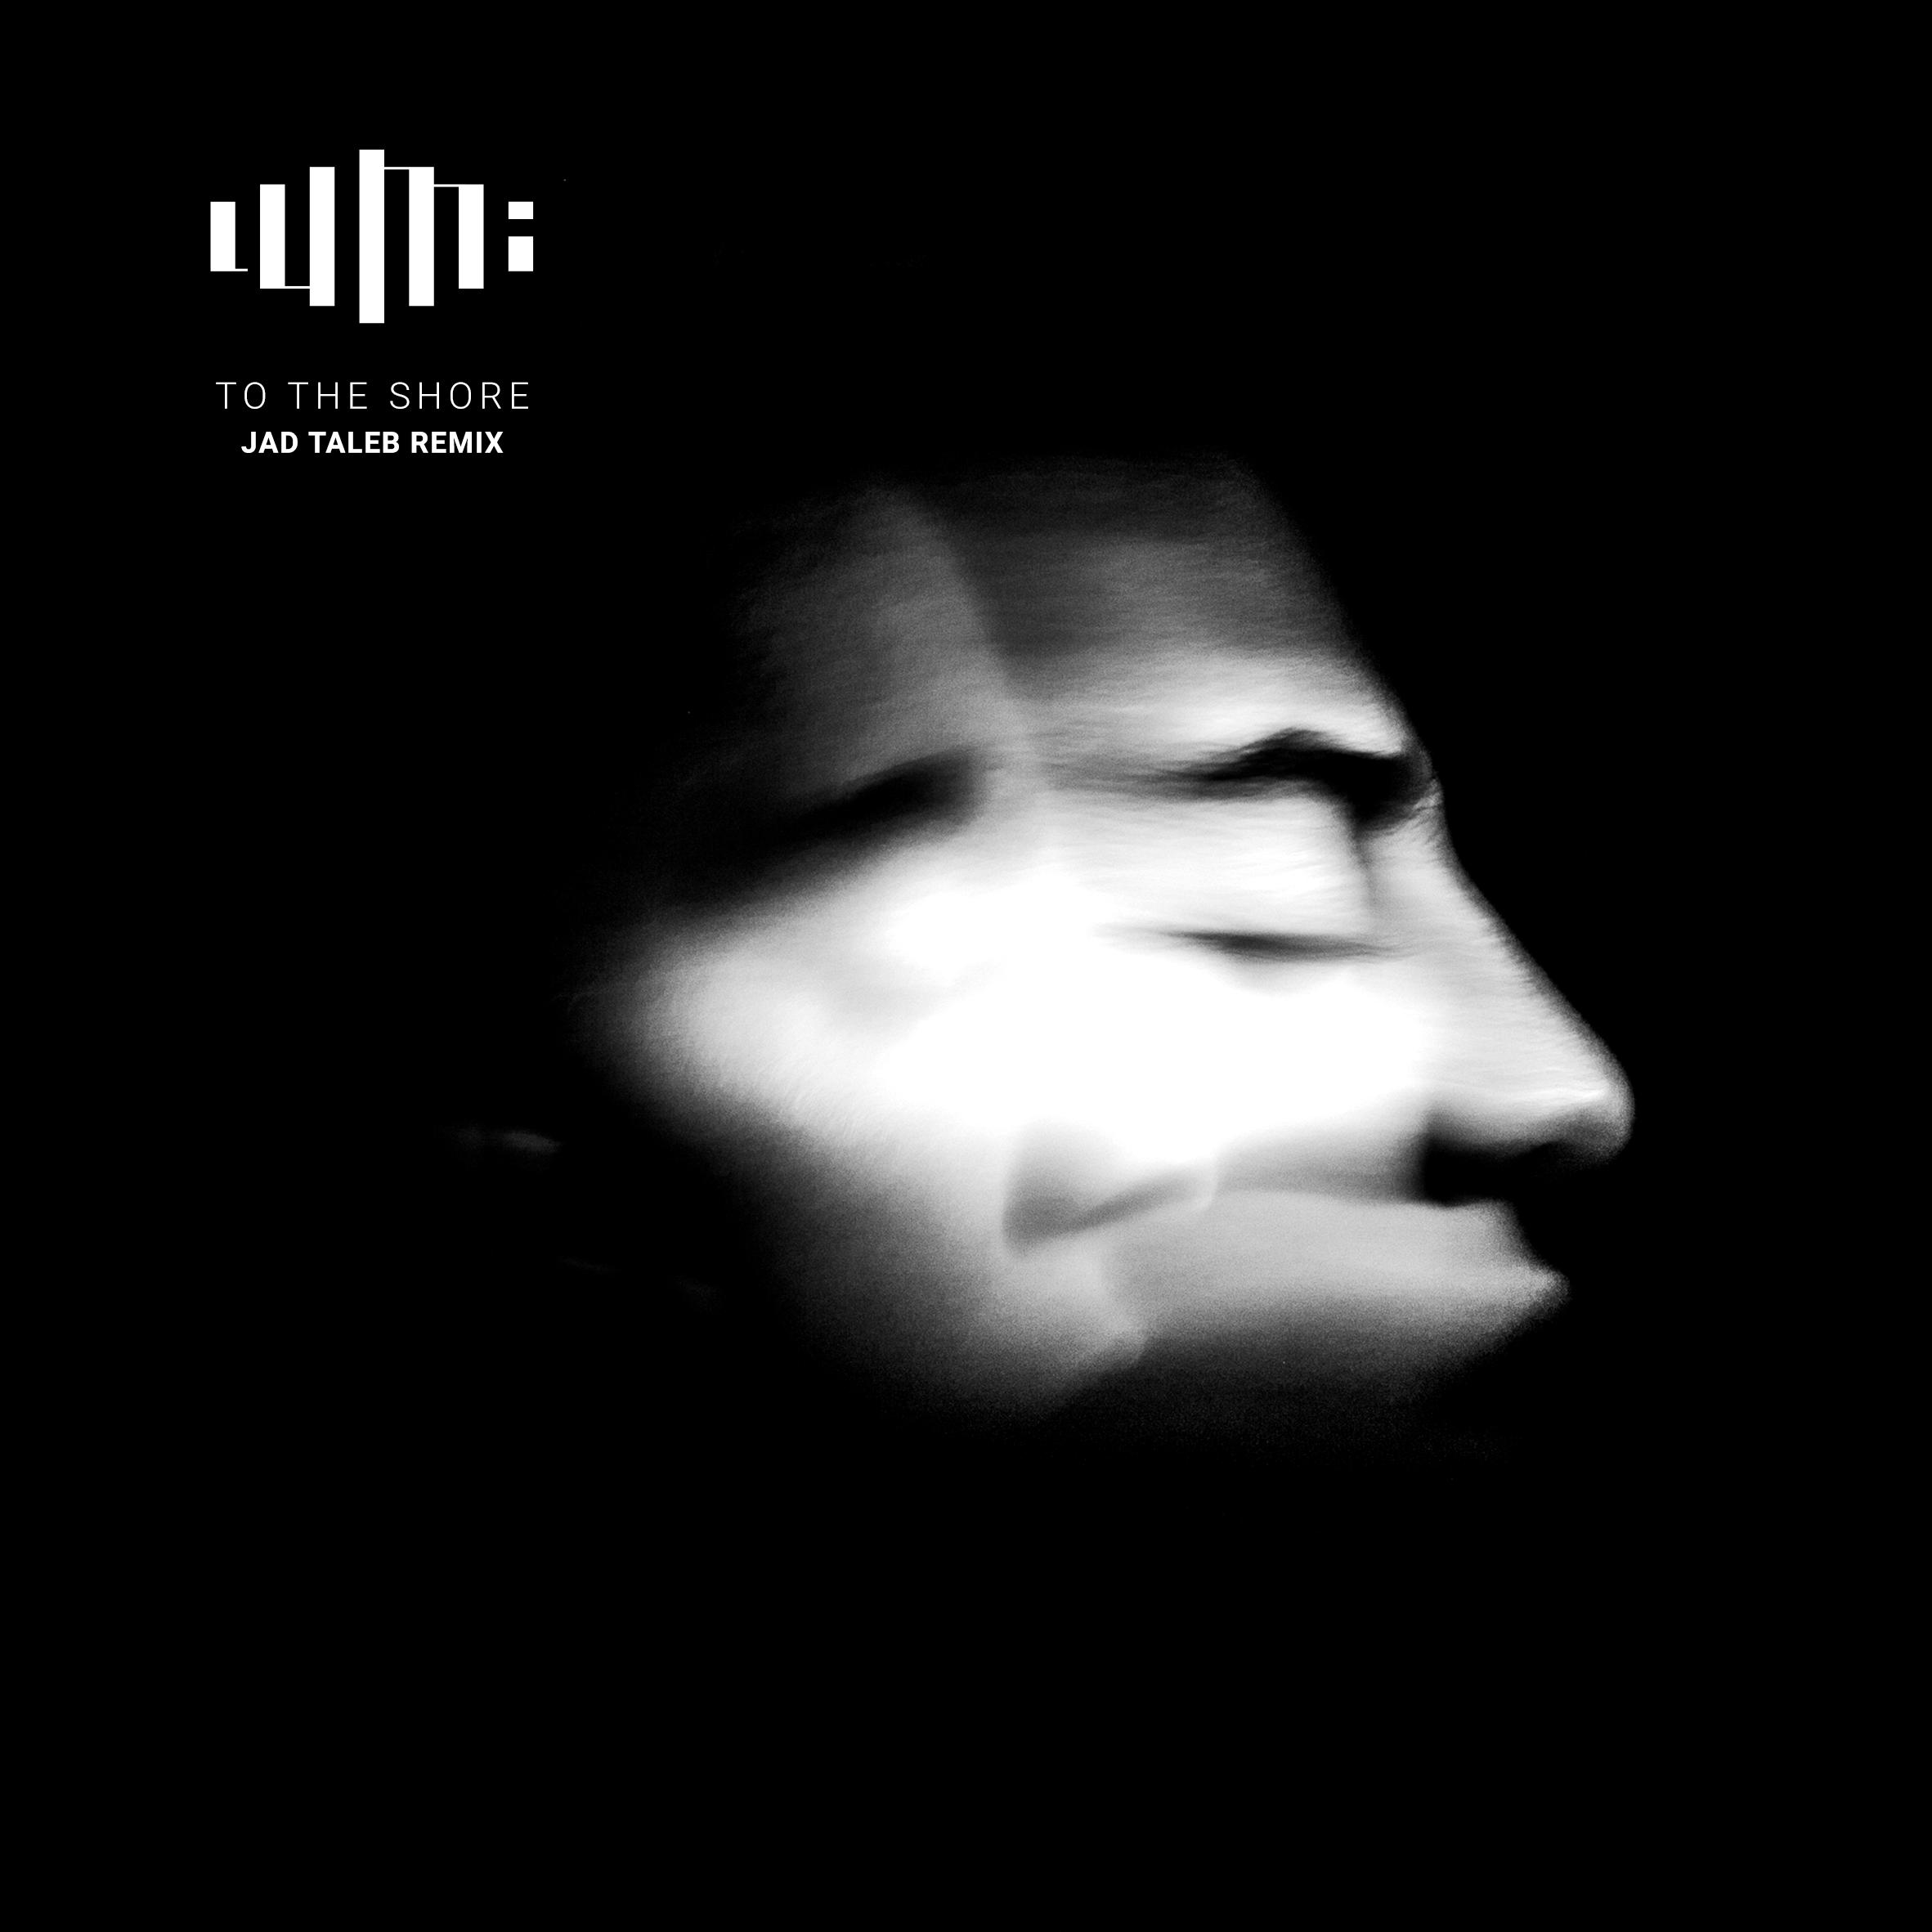 Exclusive Premiere: Lumi – To the Shore (Jad Taleb Remix)